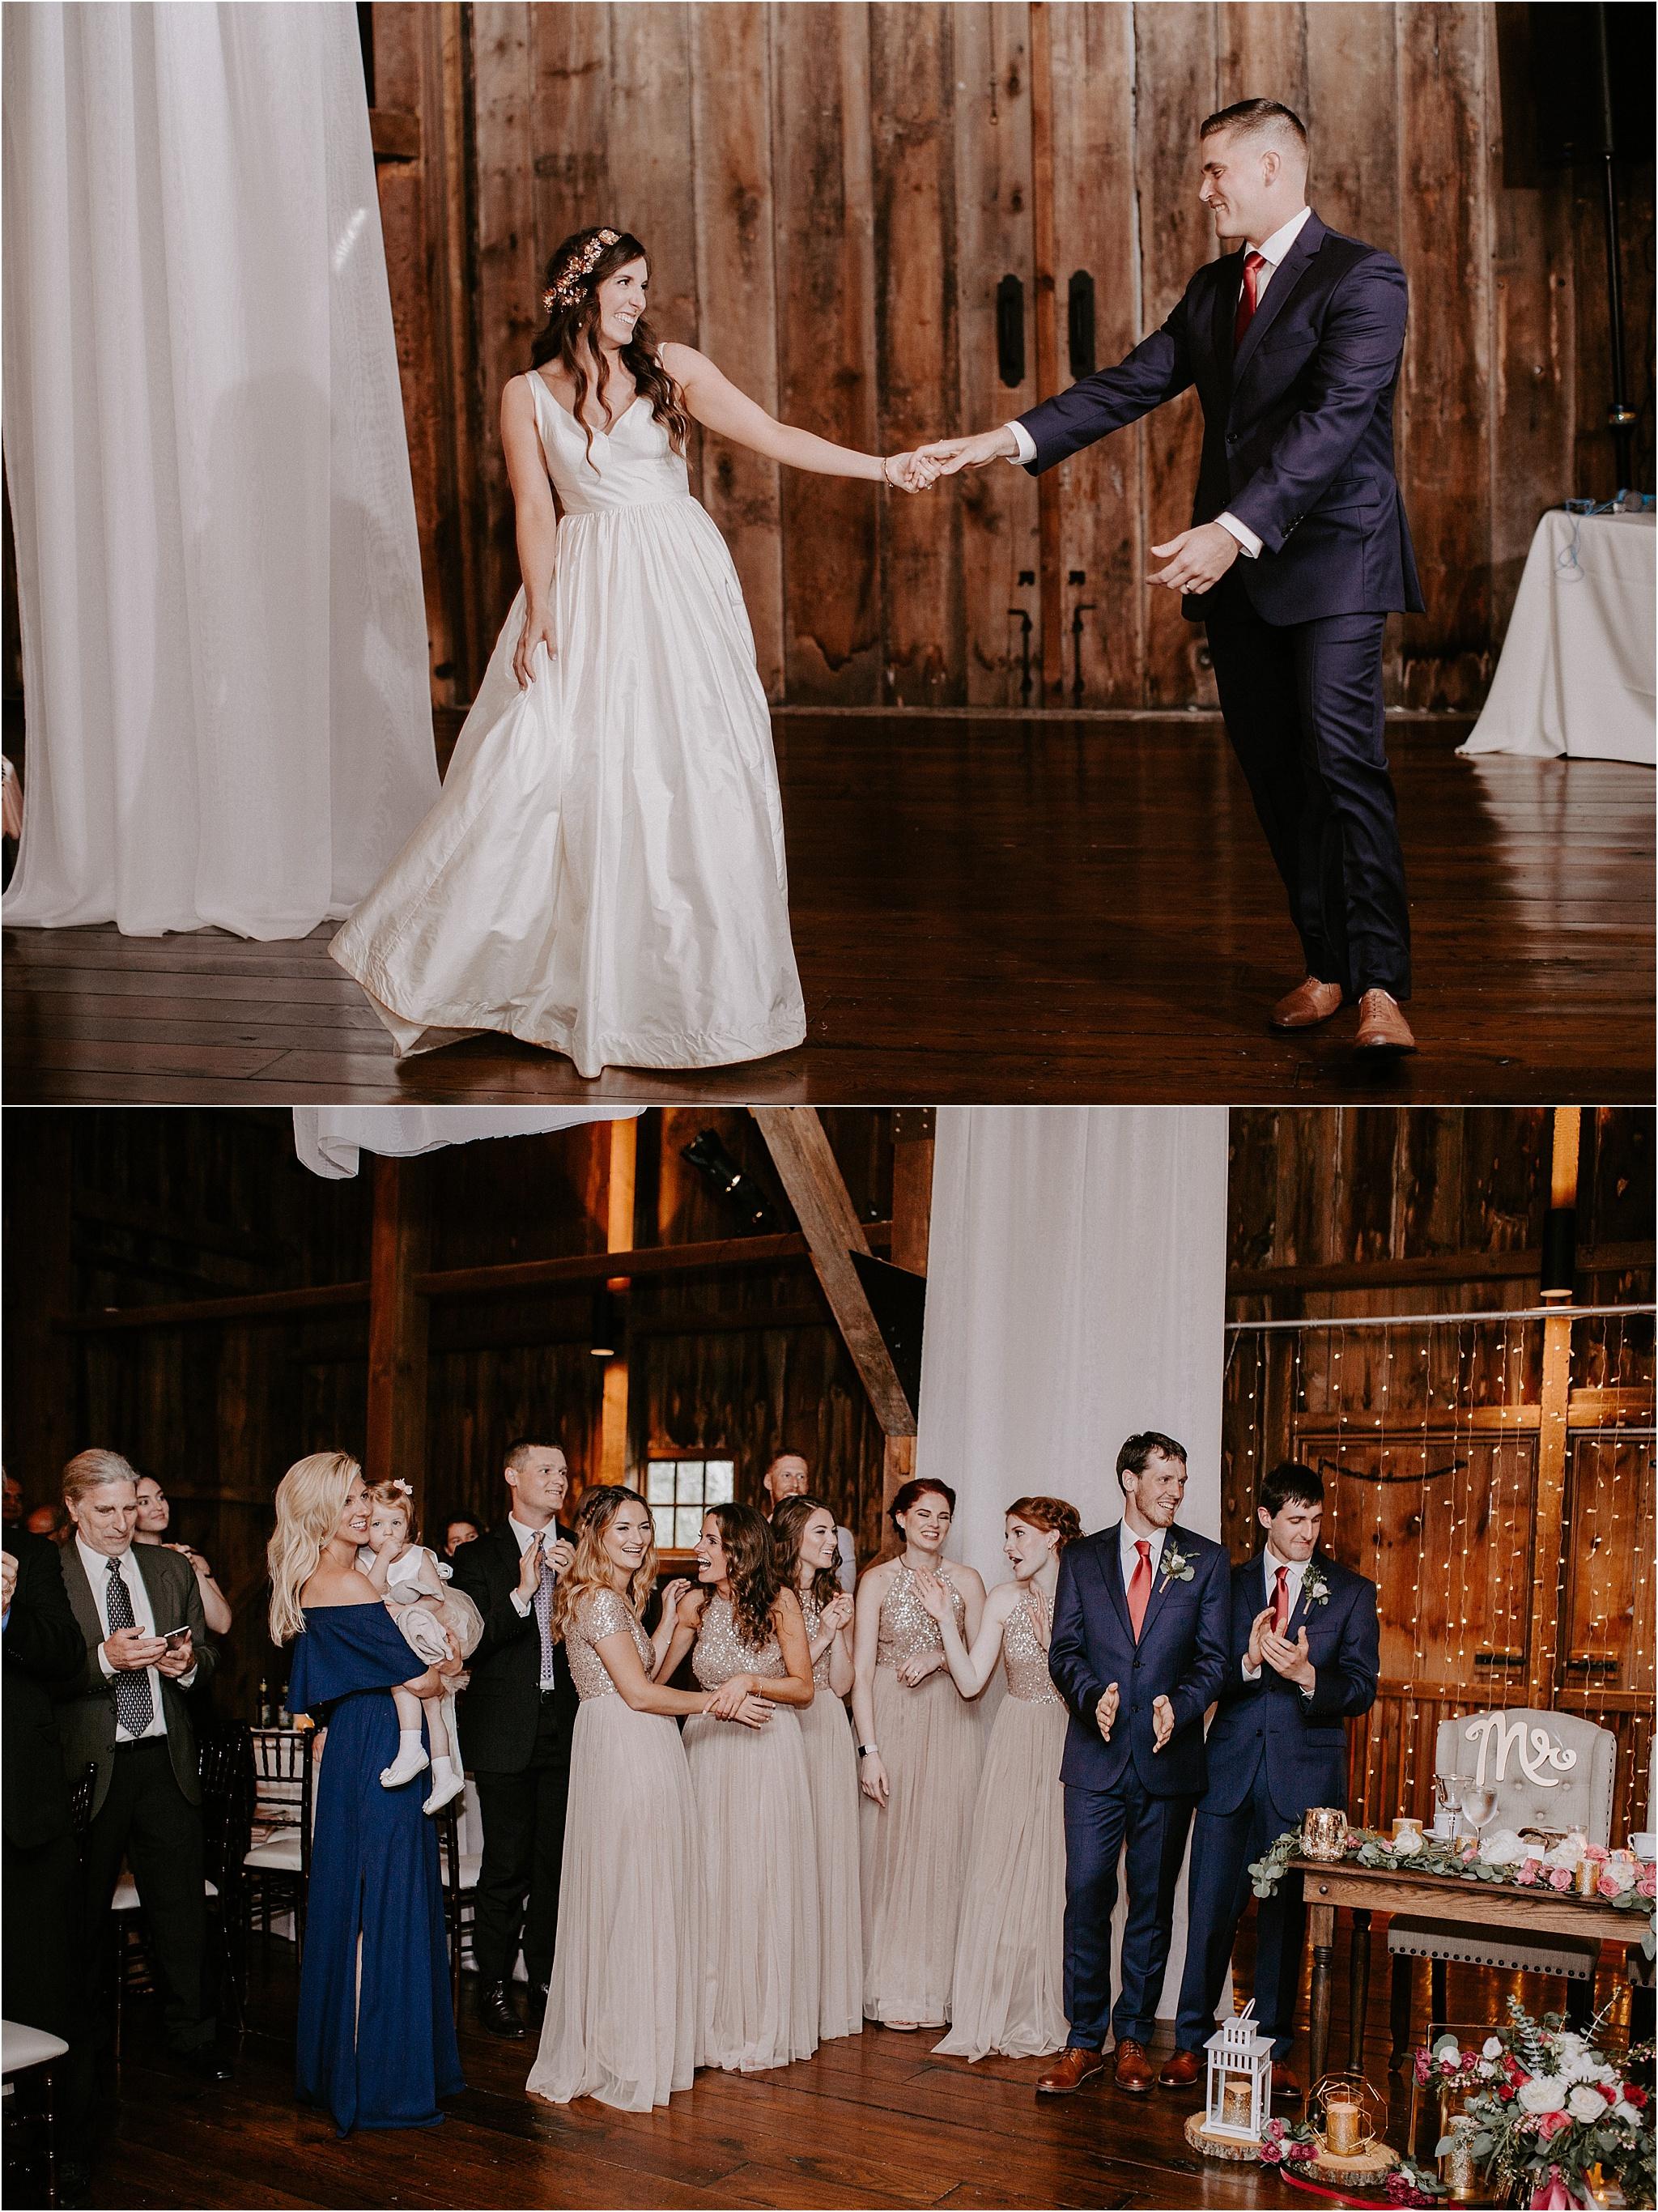 Sarah_Brookhart_Farm_at_Eagles_Ridge_Wedding_Photographer_0054.jpg